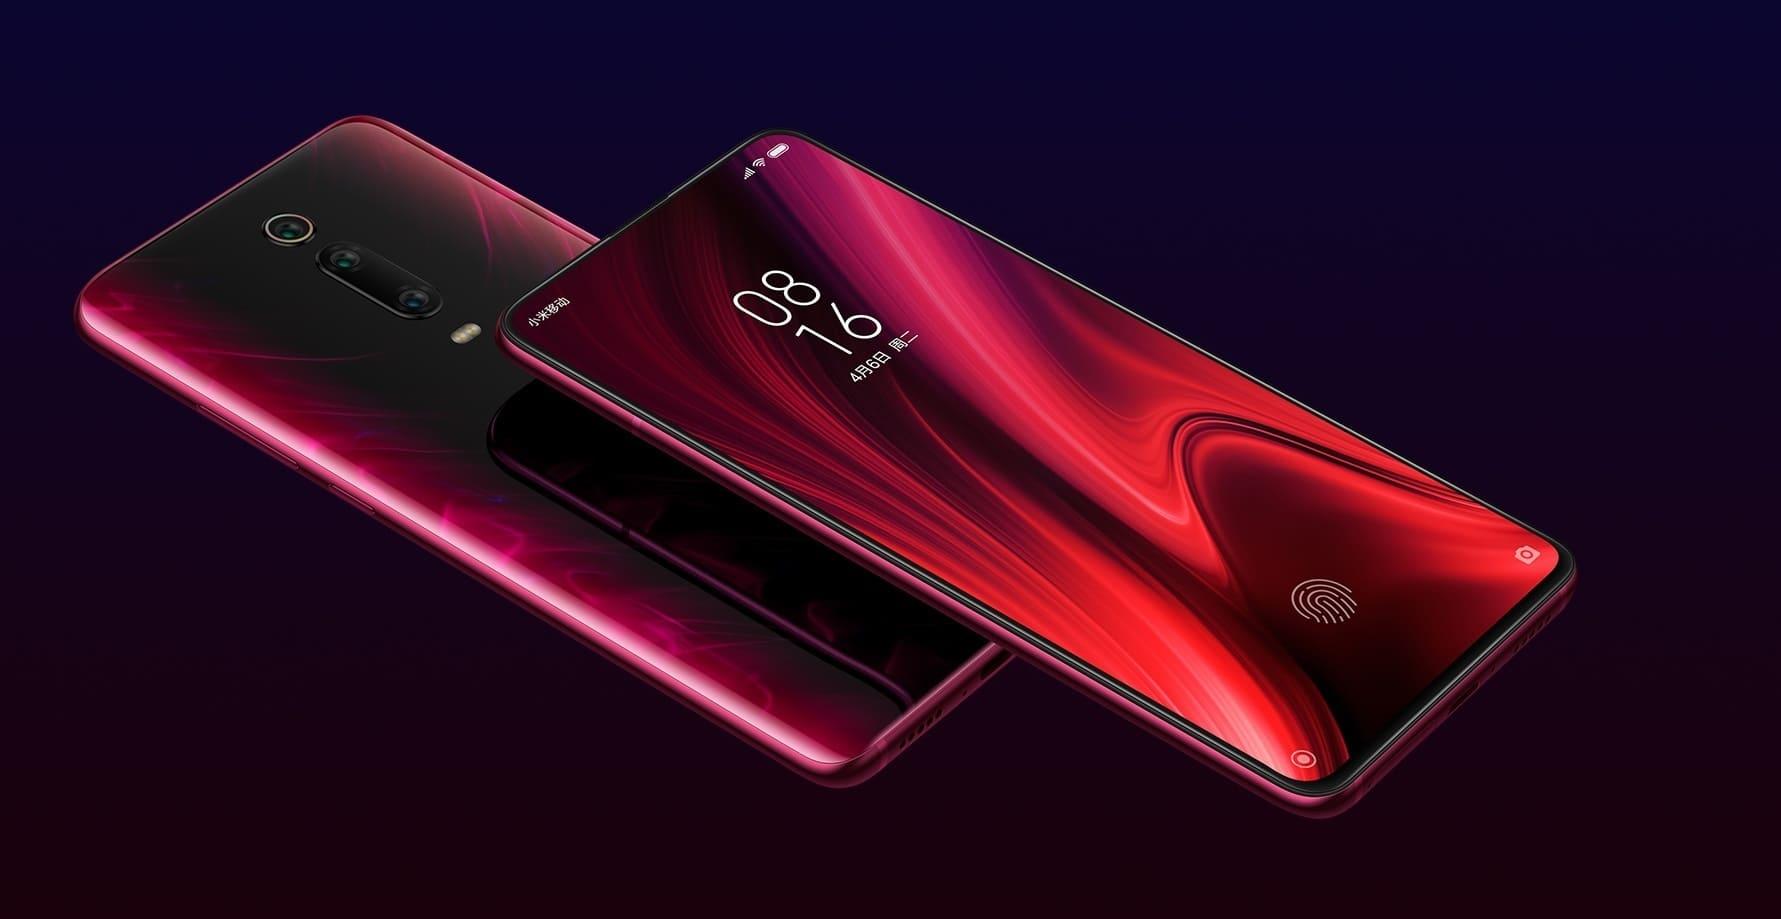 Redmi К20 и К20 Pro будет продаваться в России как Xiaomi Mi 9T и Mi 9T Pro